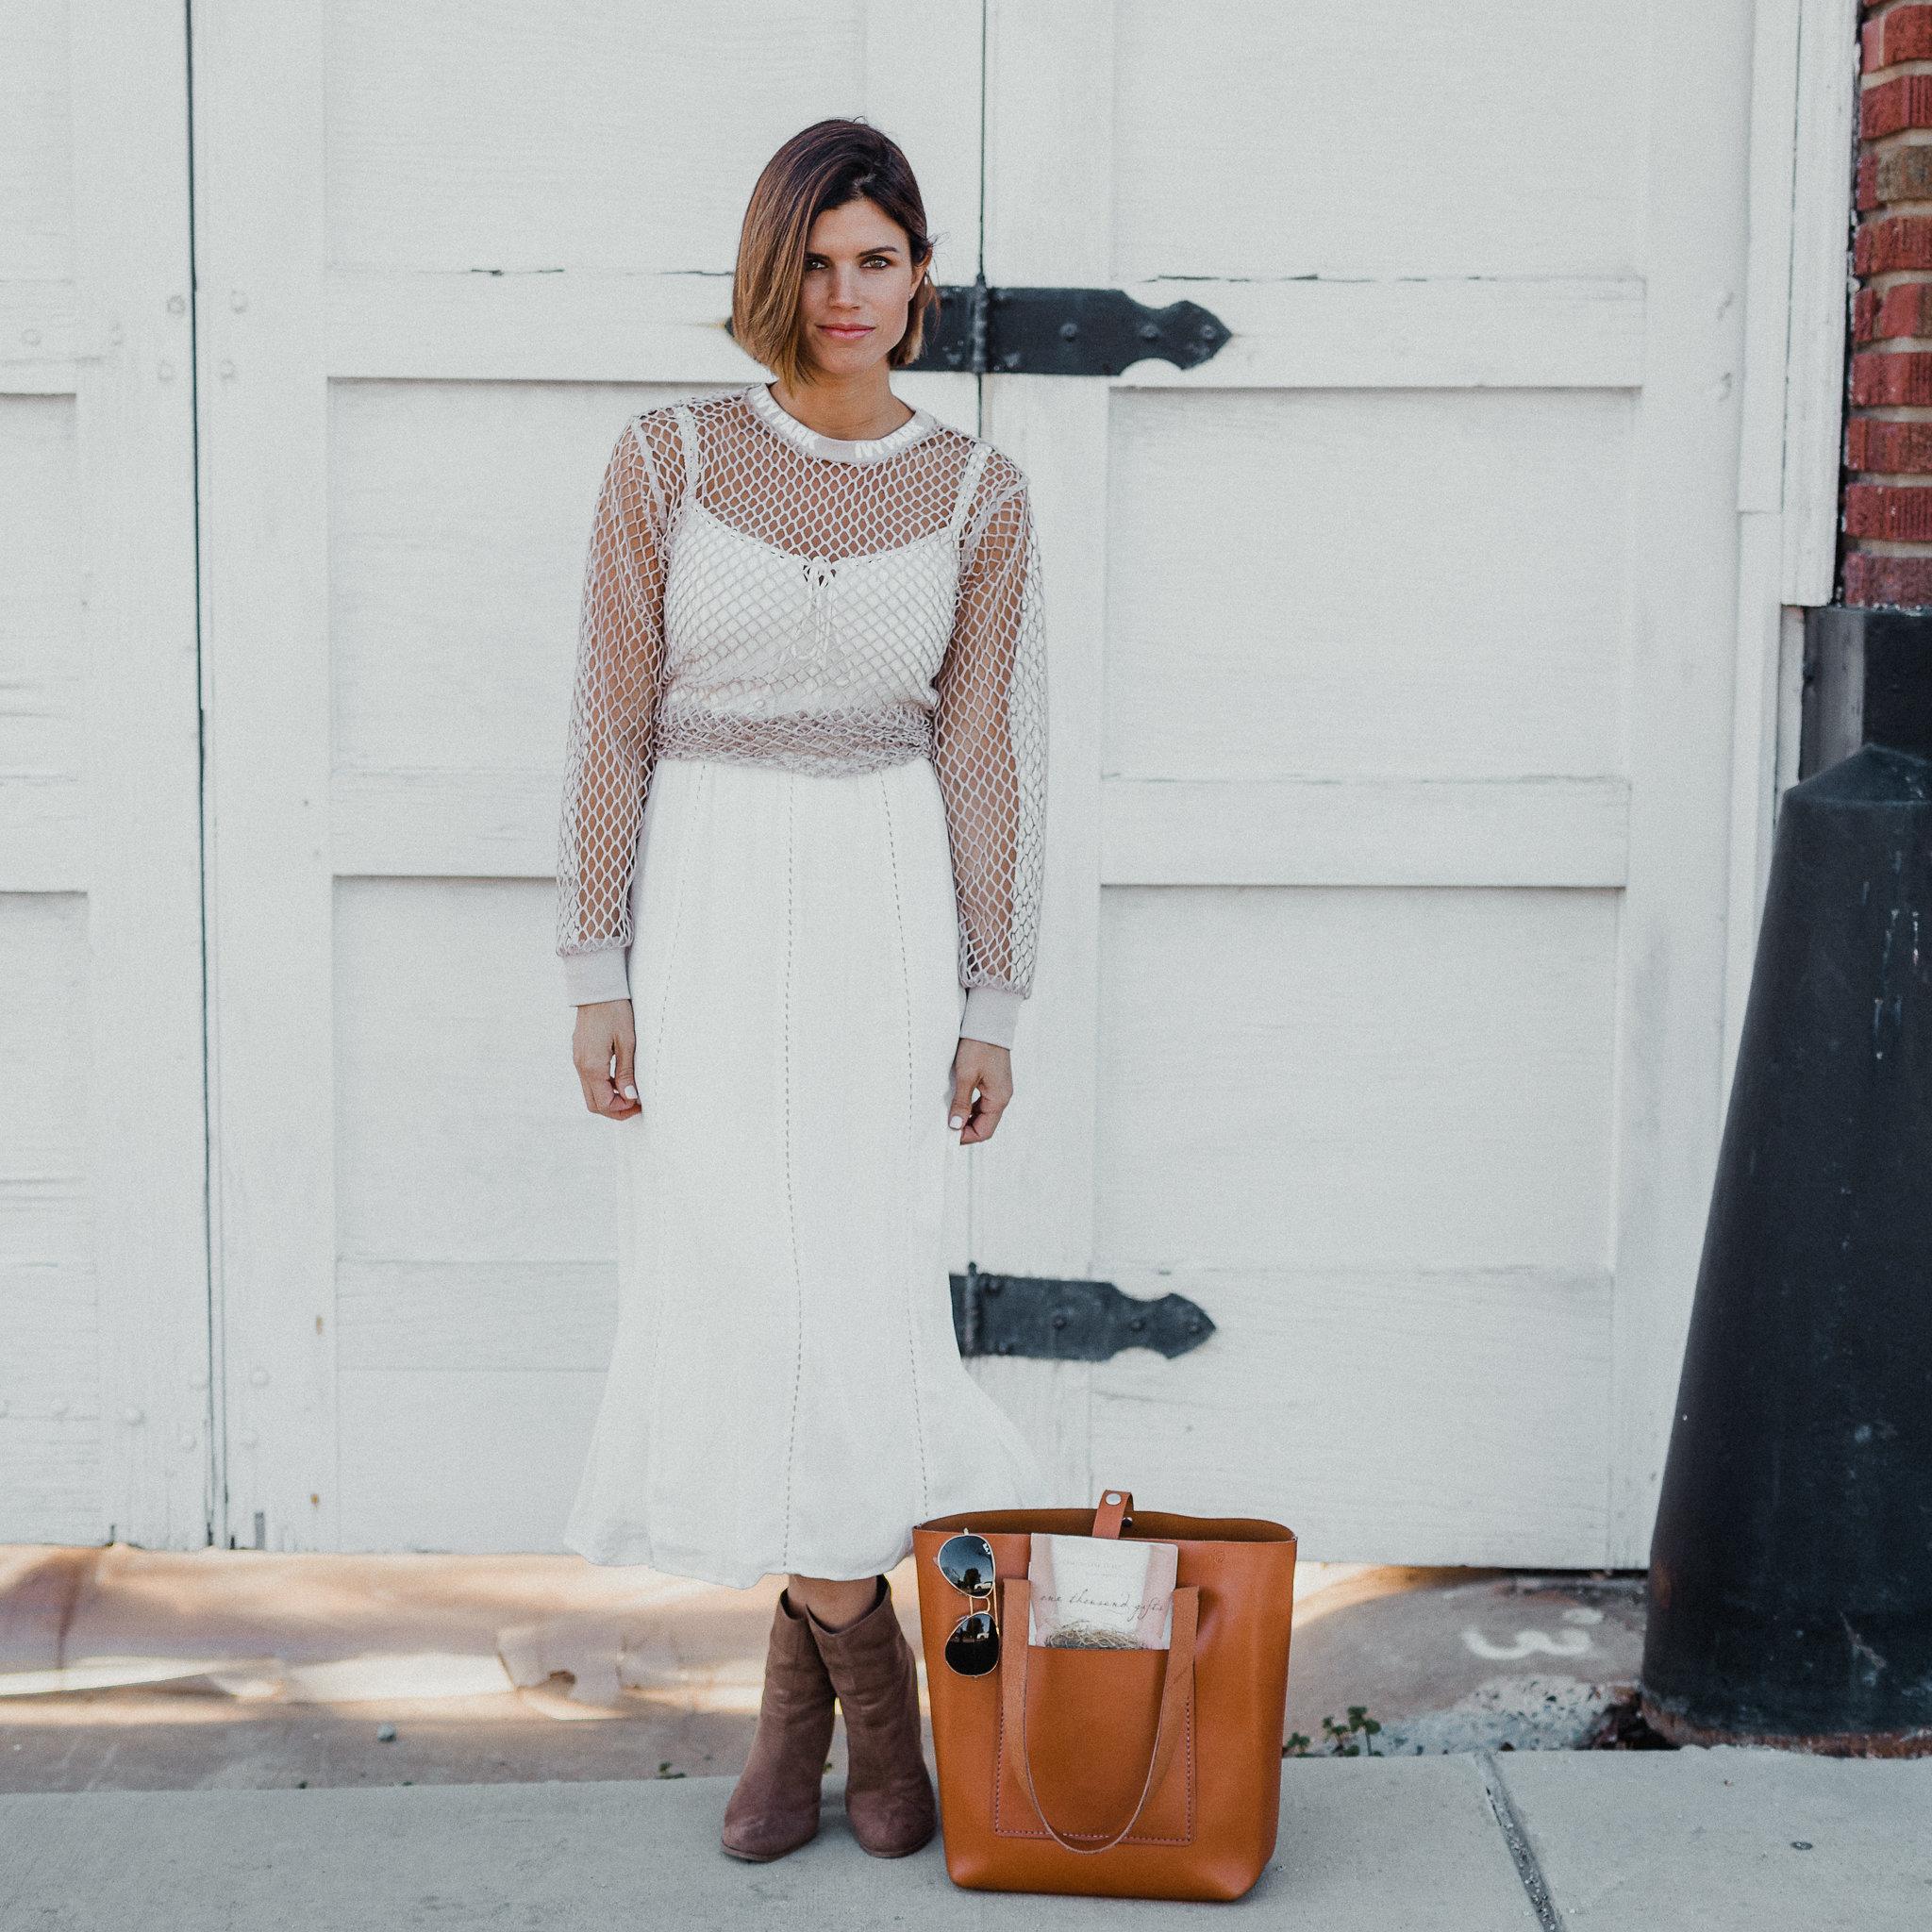 fashion-blogger-white-dress-lace-top.jpg